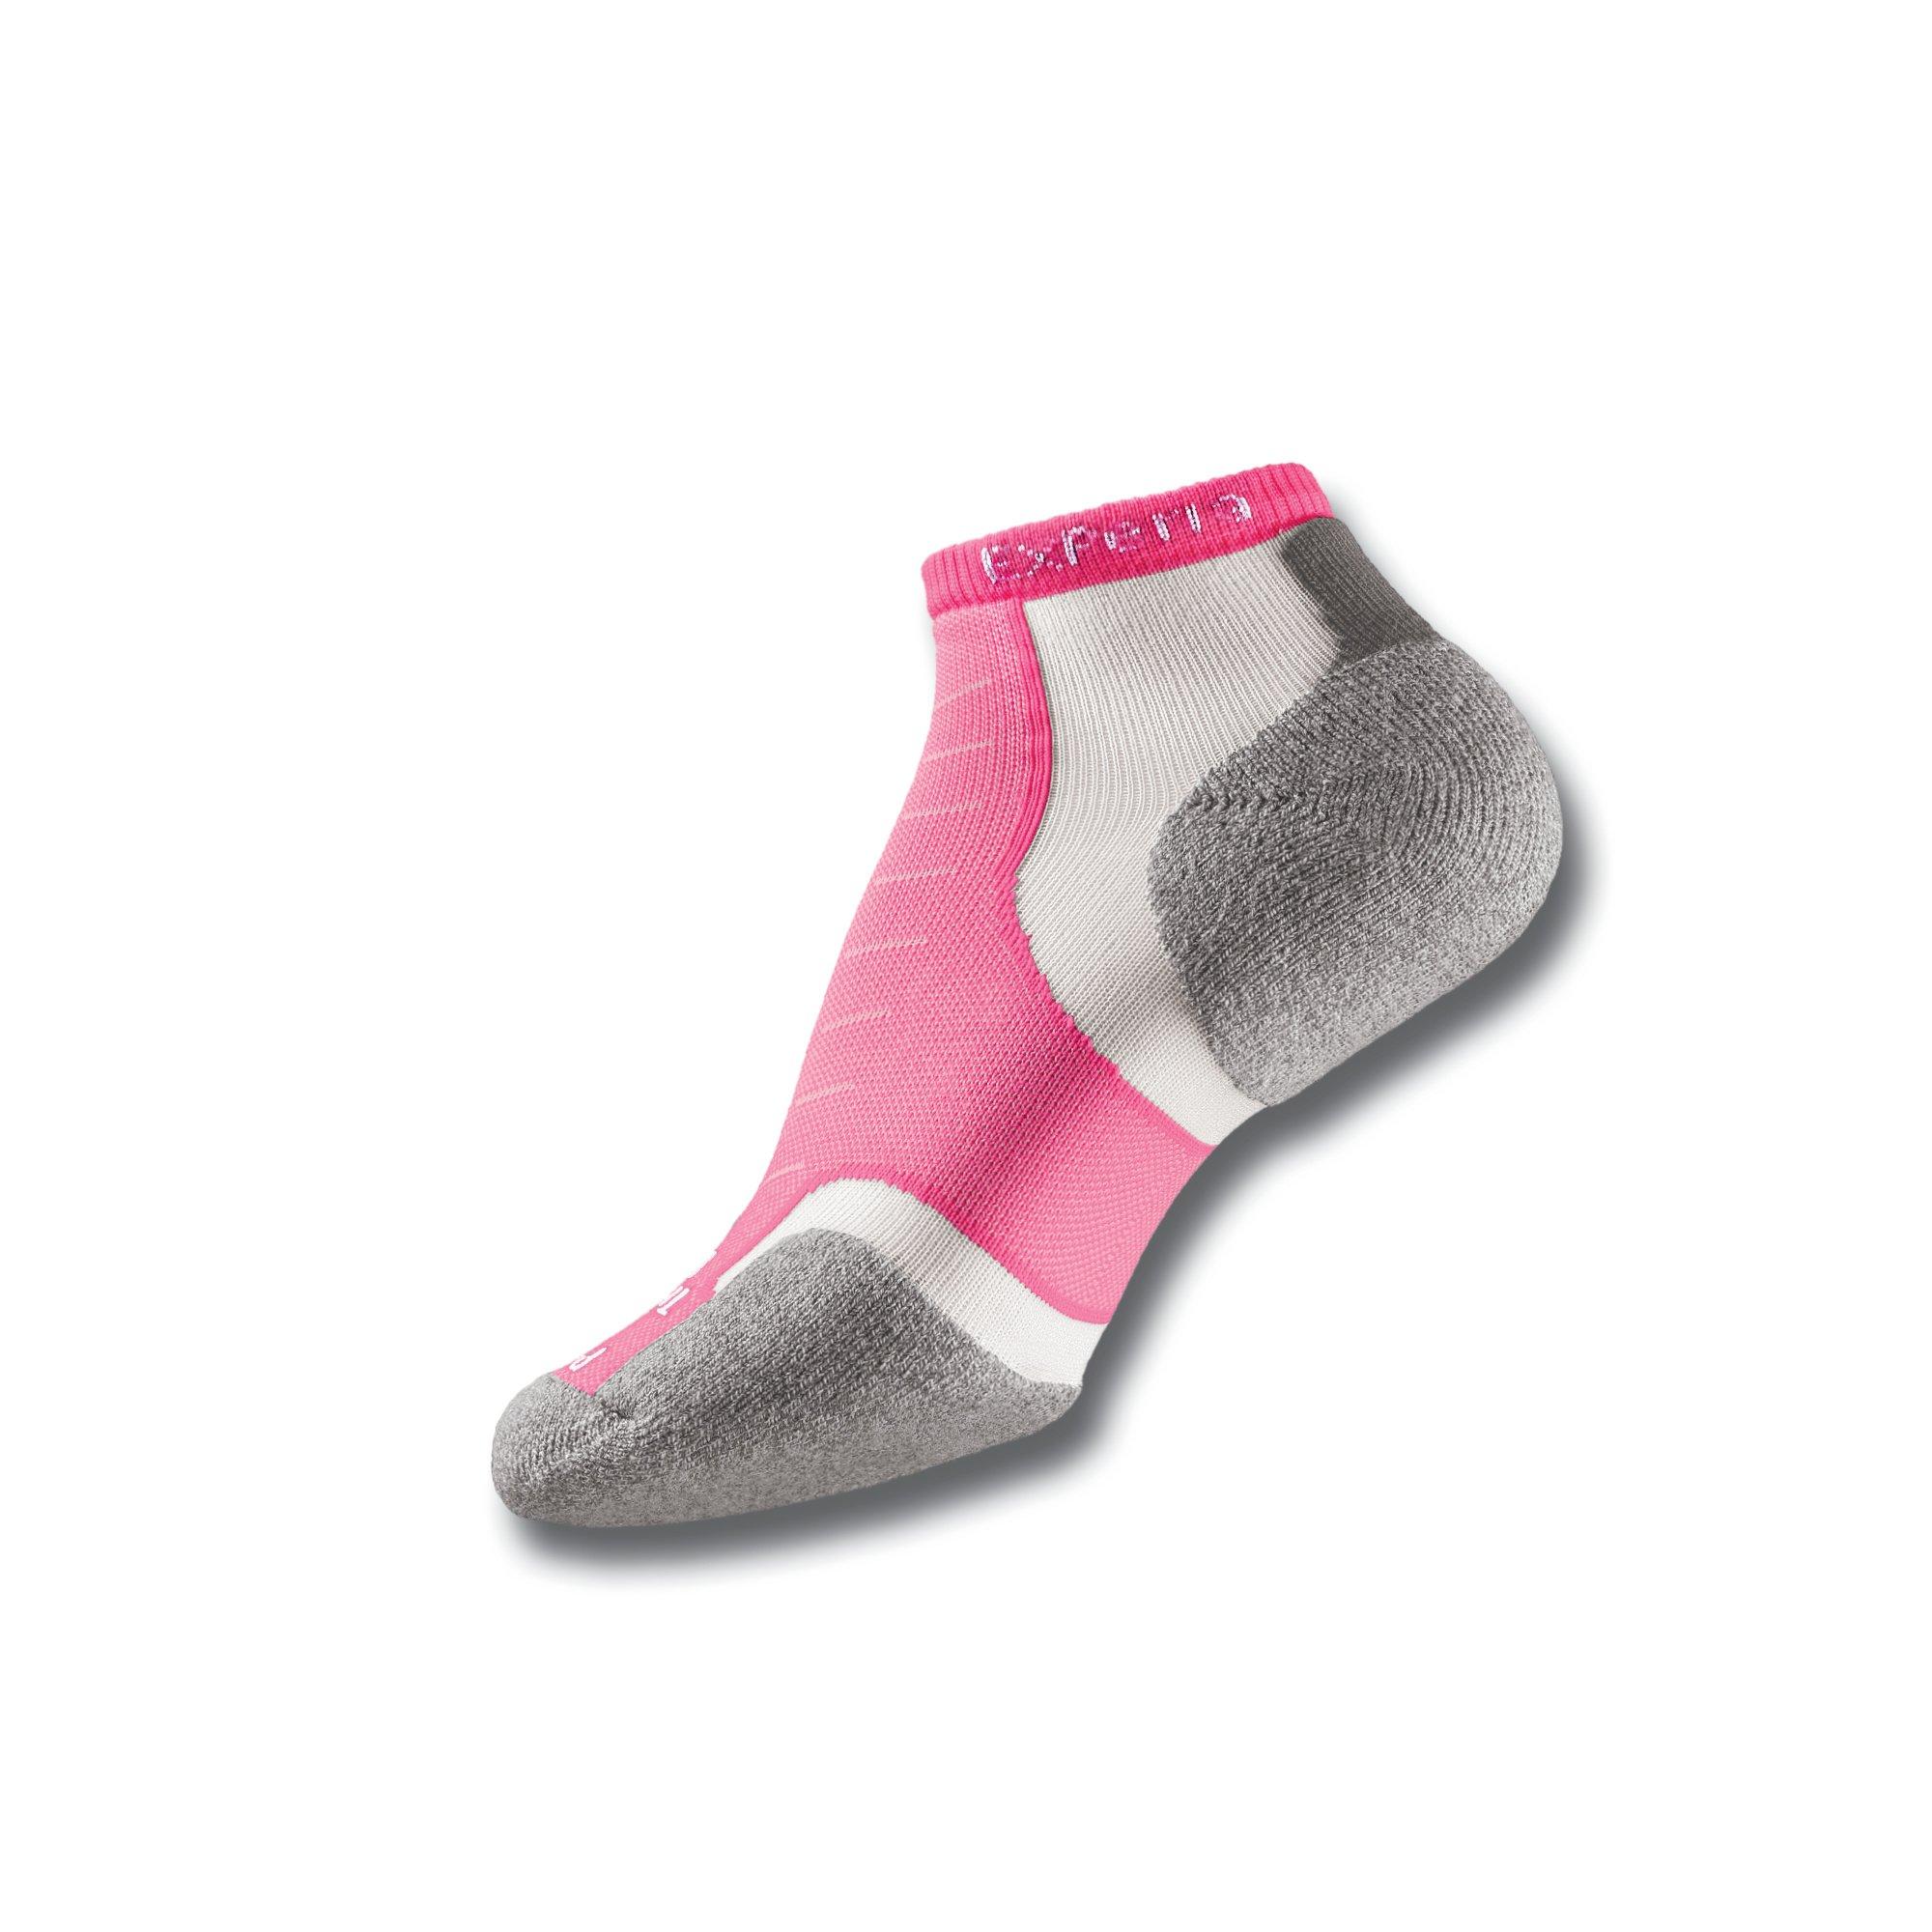 Thorlos Experia Unisex XCCU Multi-Sport Thin Padded Low Cut Sock, Pink, Small